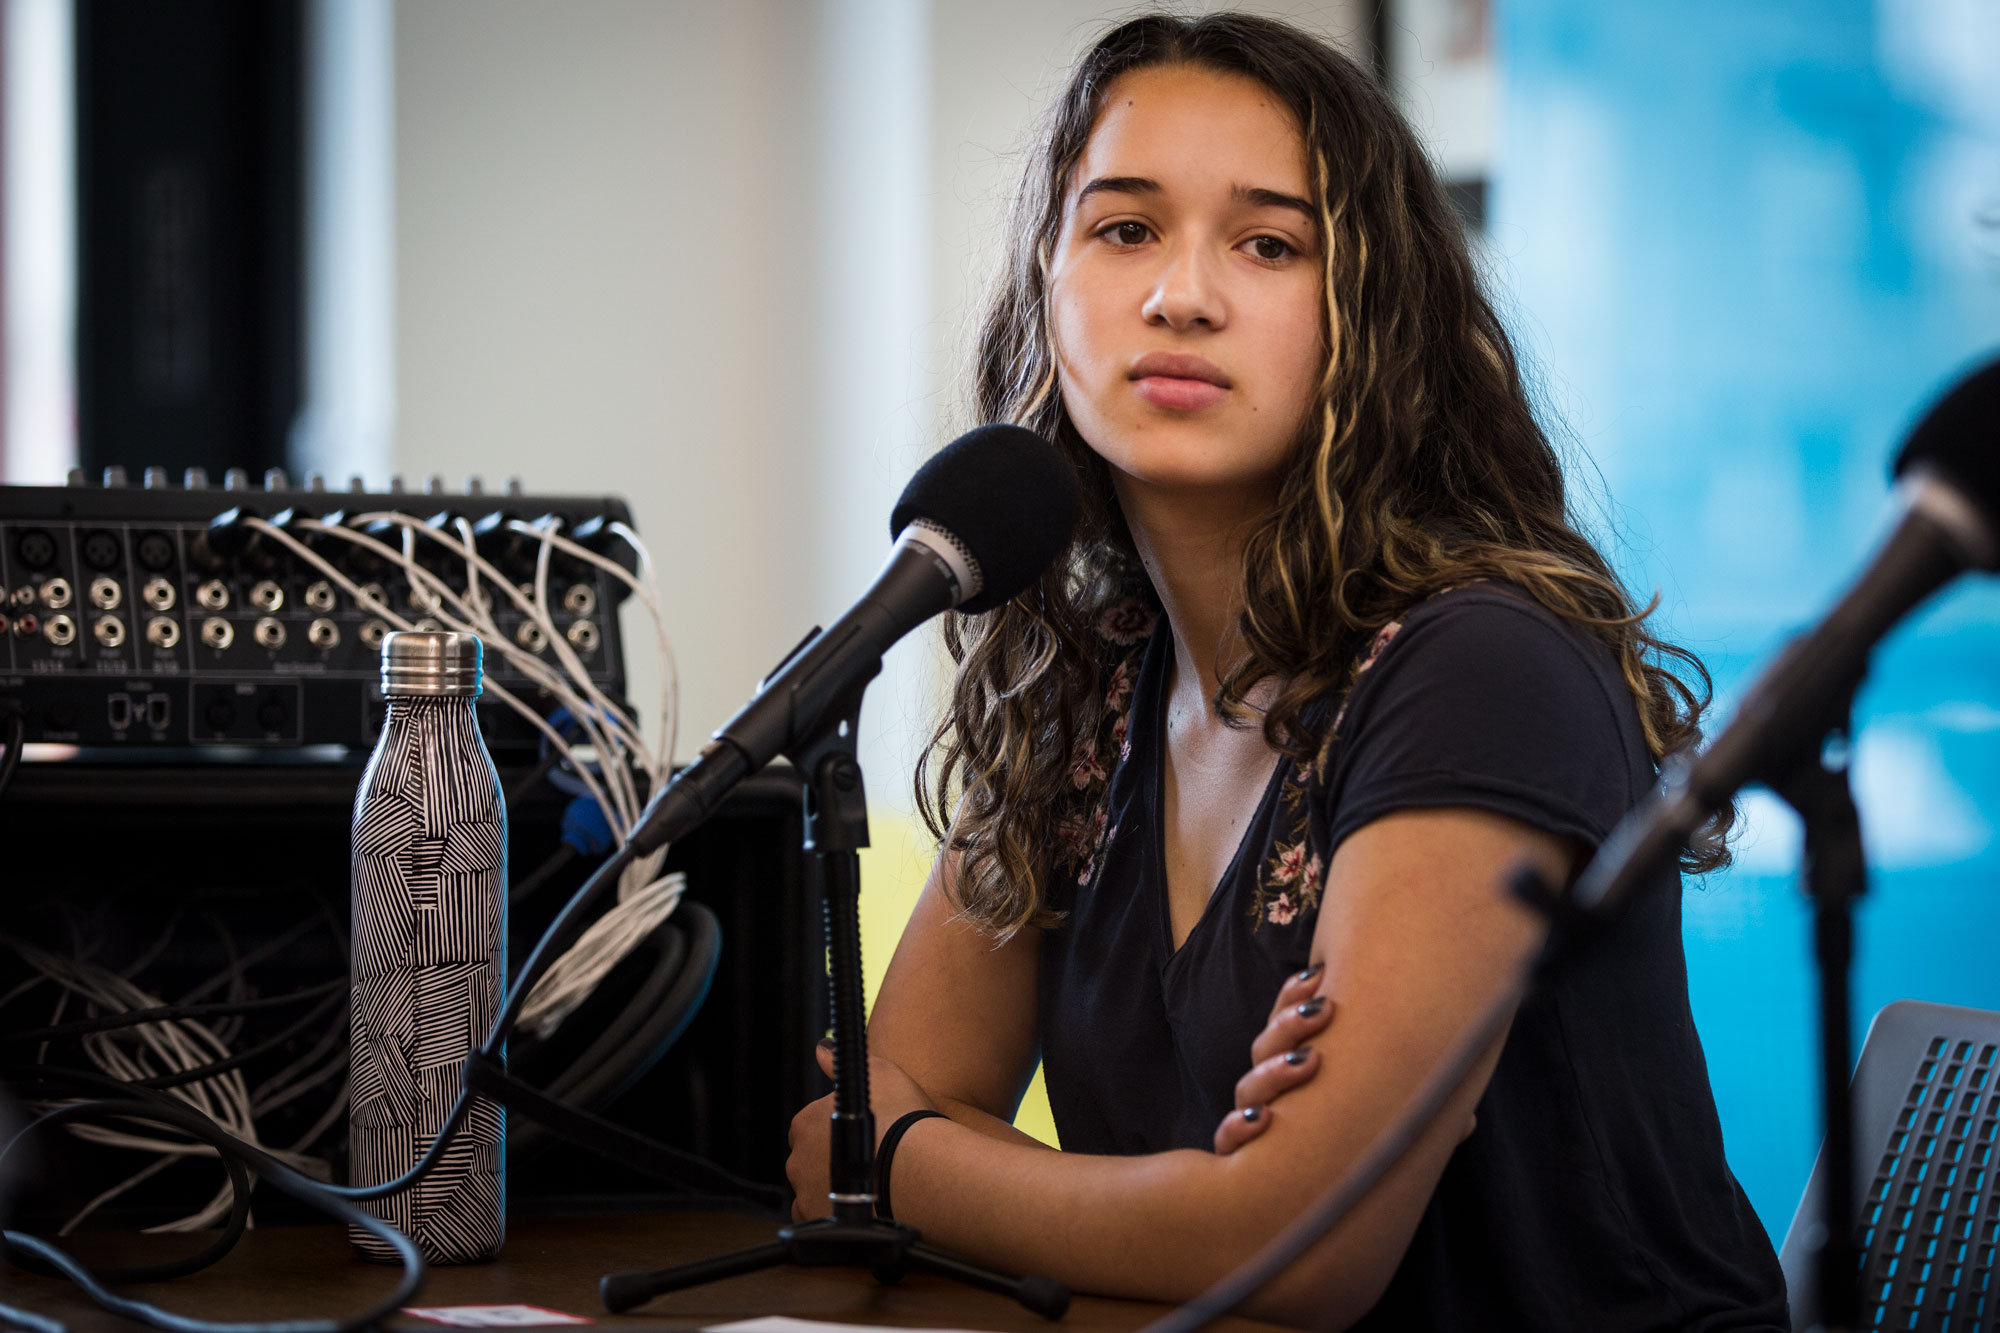 Photo: STEM Shooting Student Panel Colorado Matters 4 HV